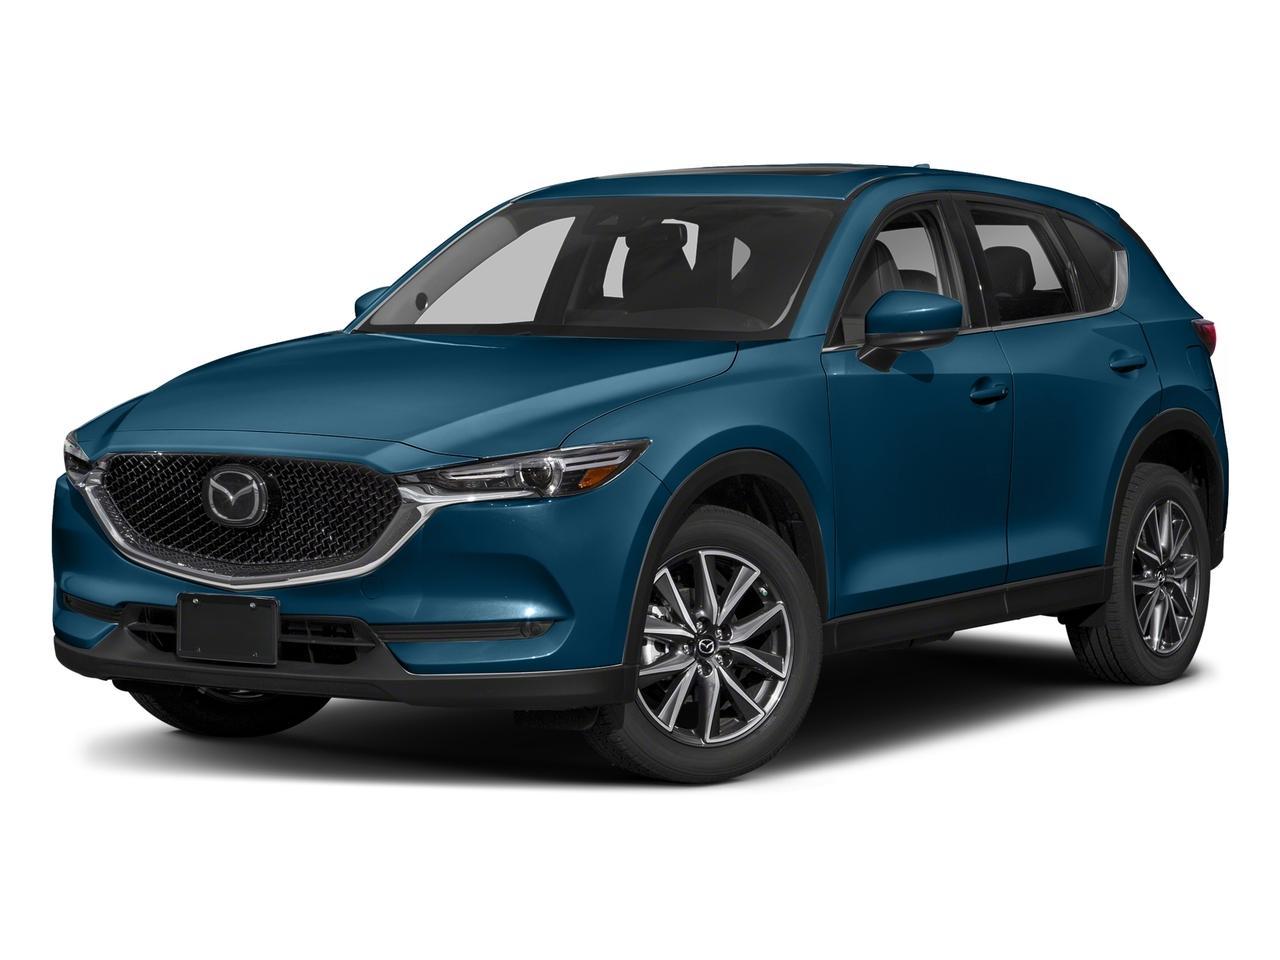 2018 Mazda CX-5 Vehicle Photo in San Antonio, TX 78238